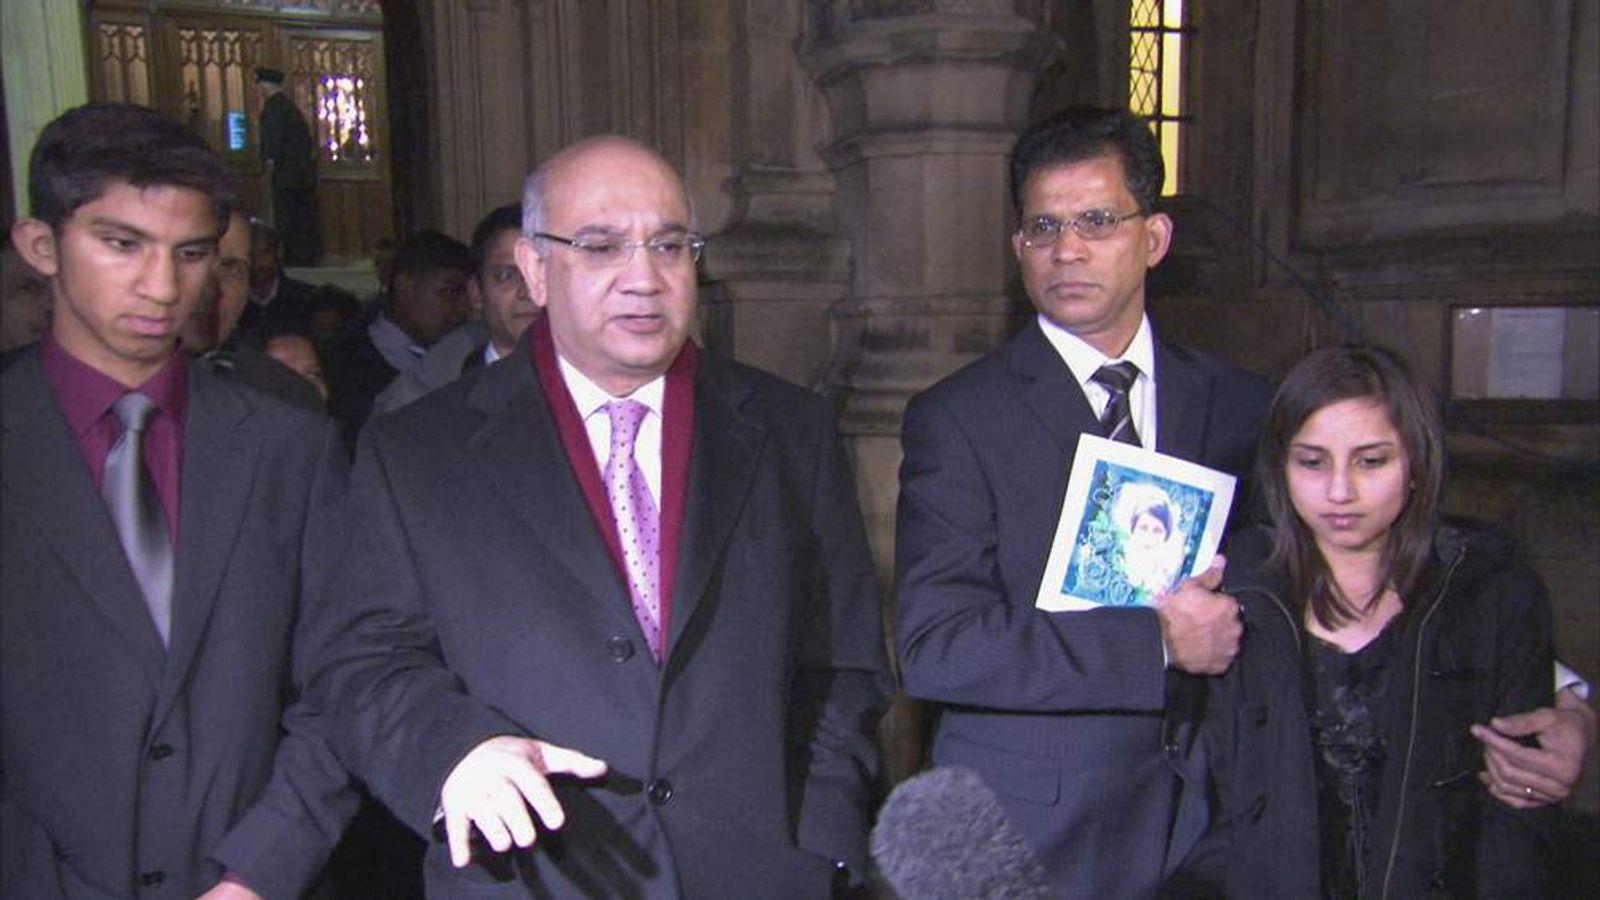 The family of Jacintha saldanha with Keith Vaz MP